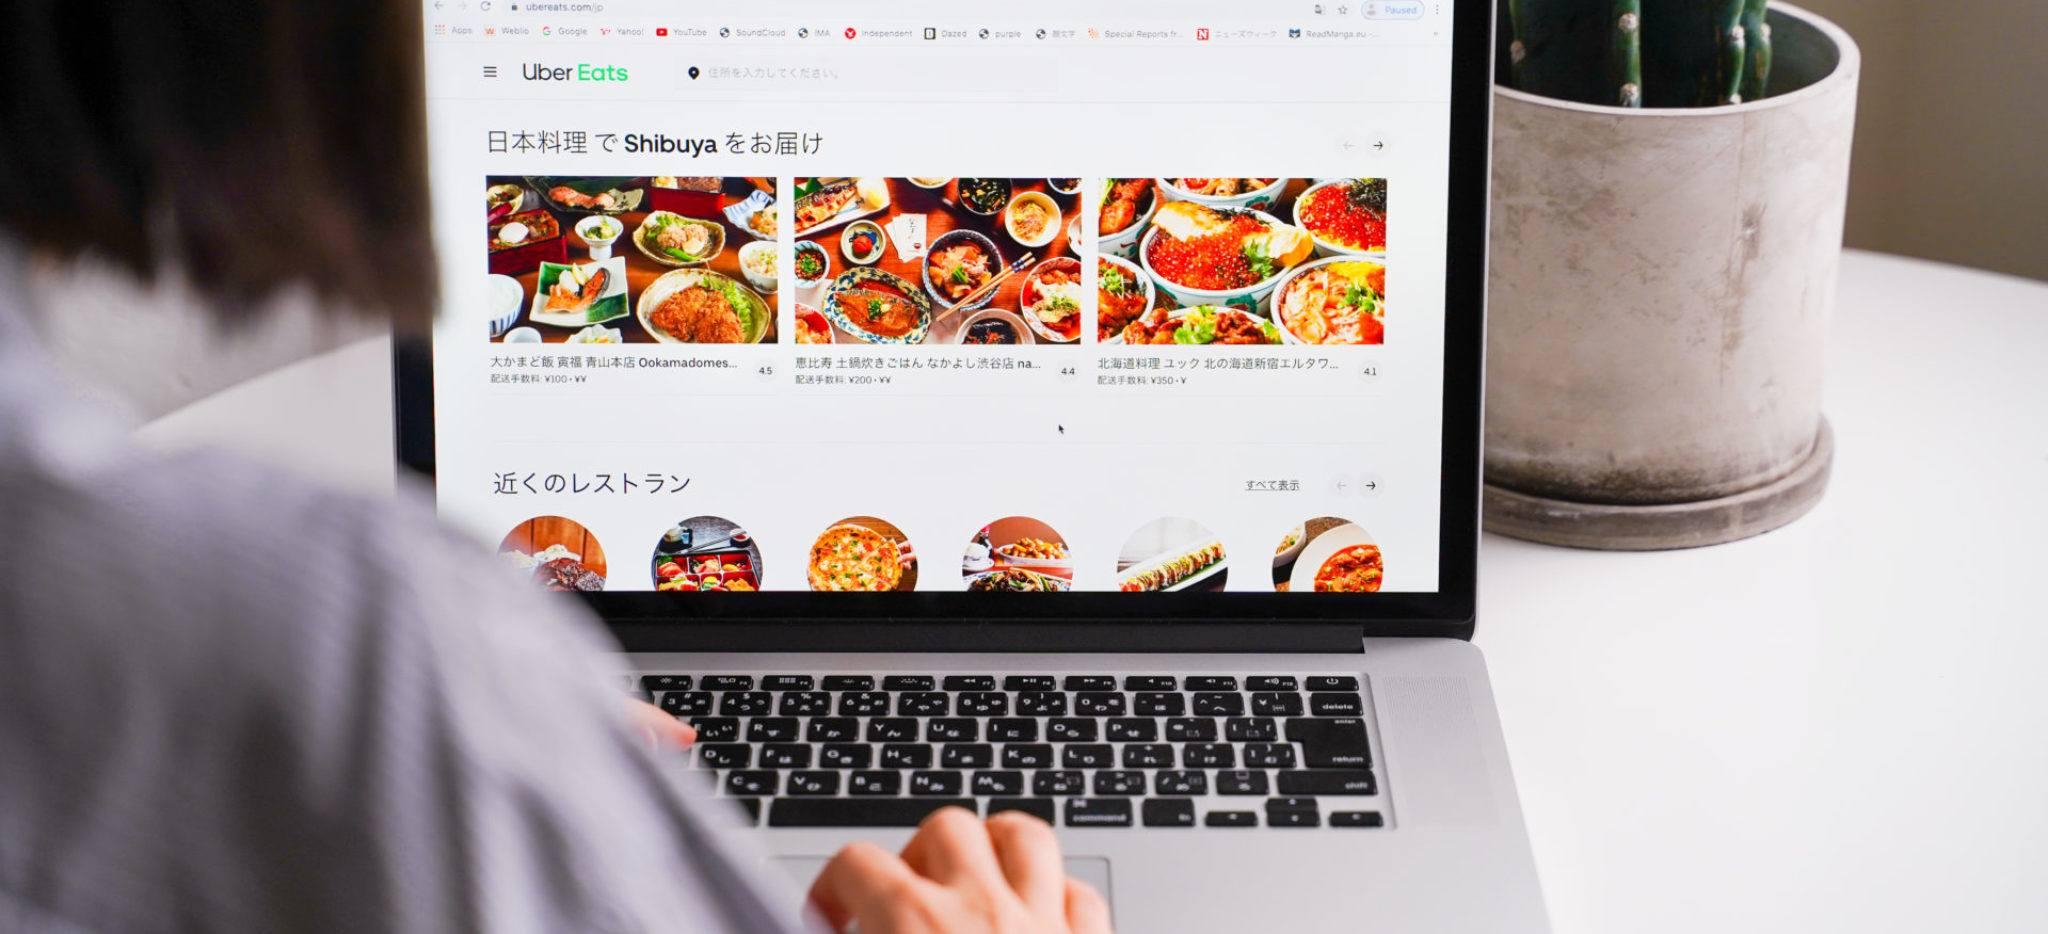 ordinare cibo online in Giappone